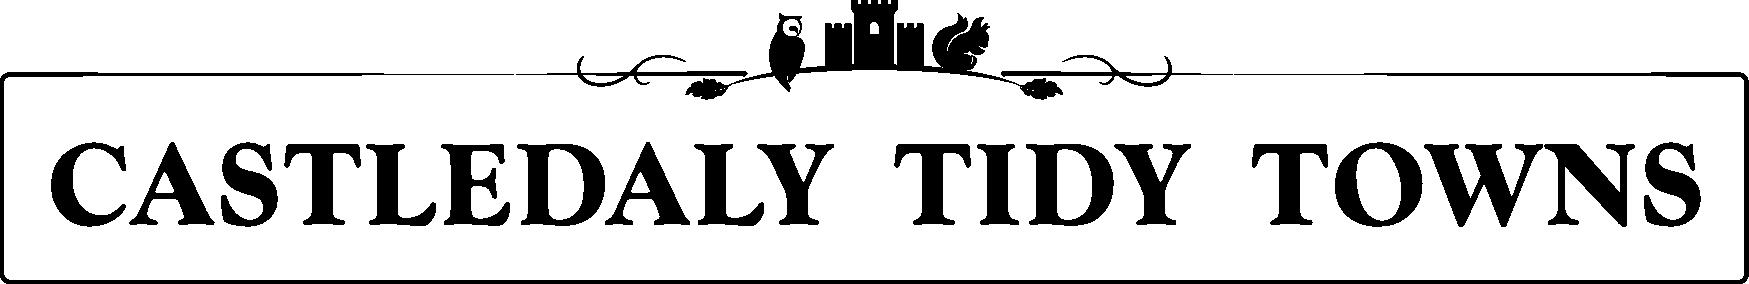 Castledaly Tidy Towns logo